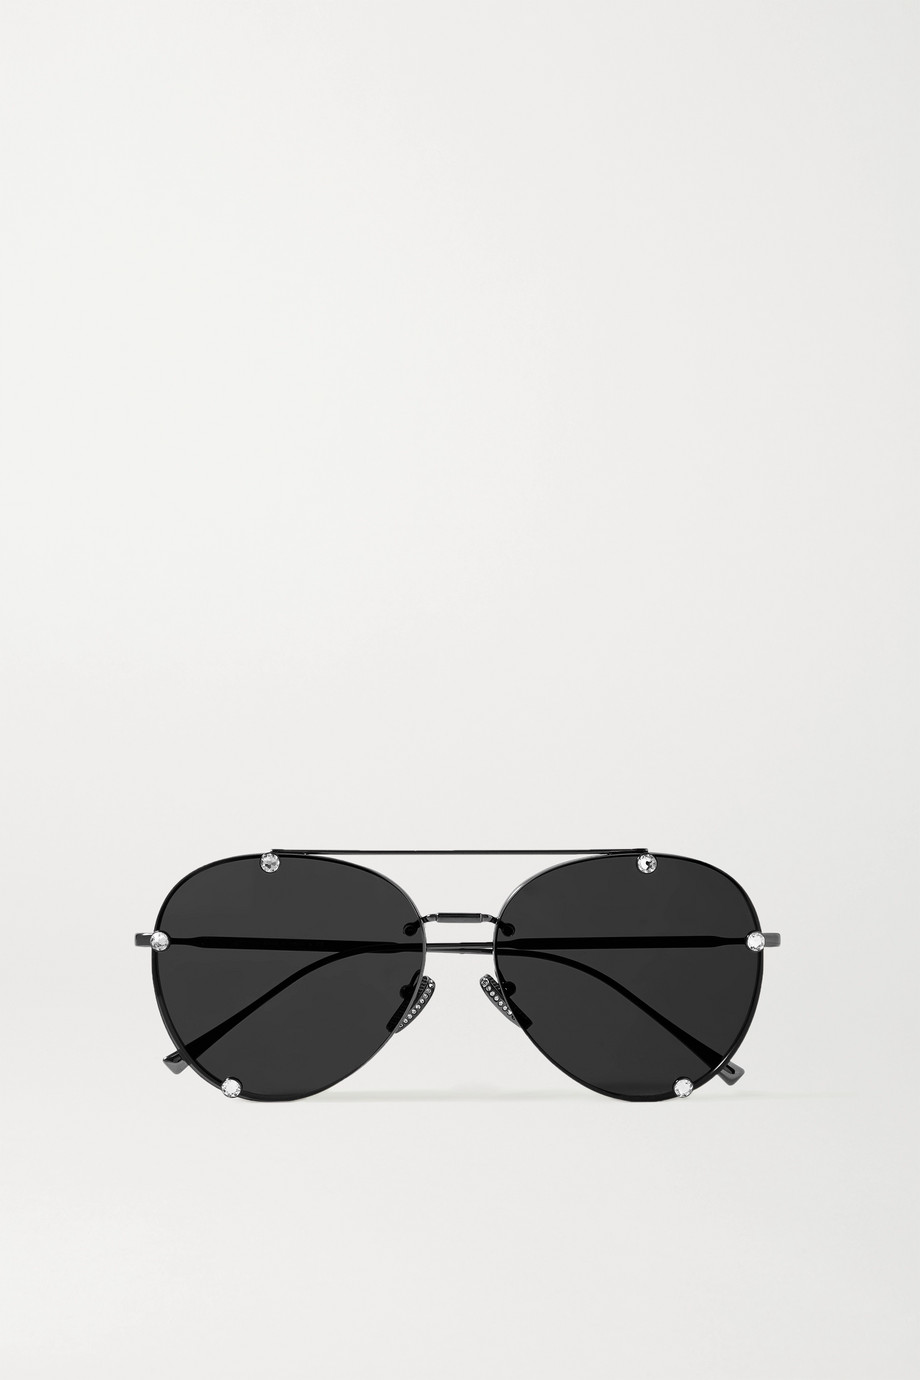 Valentino Valentino Garavani Glamtech aviator-style crystal-embellished gunmetal-tone sunglasses